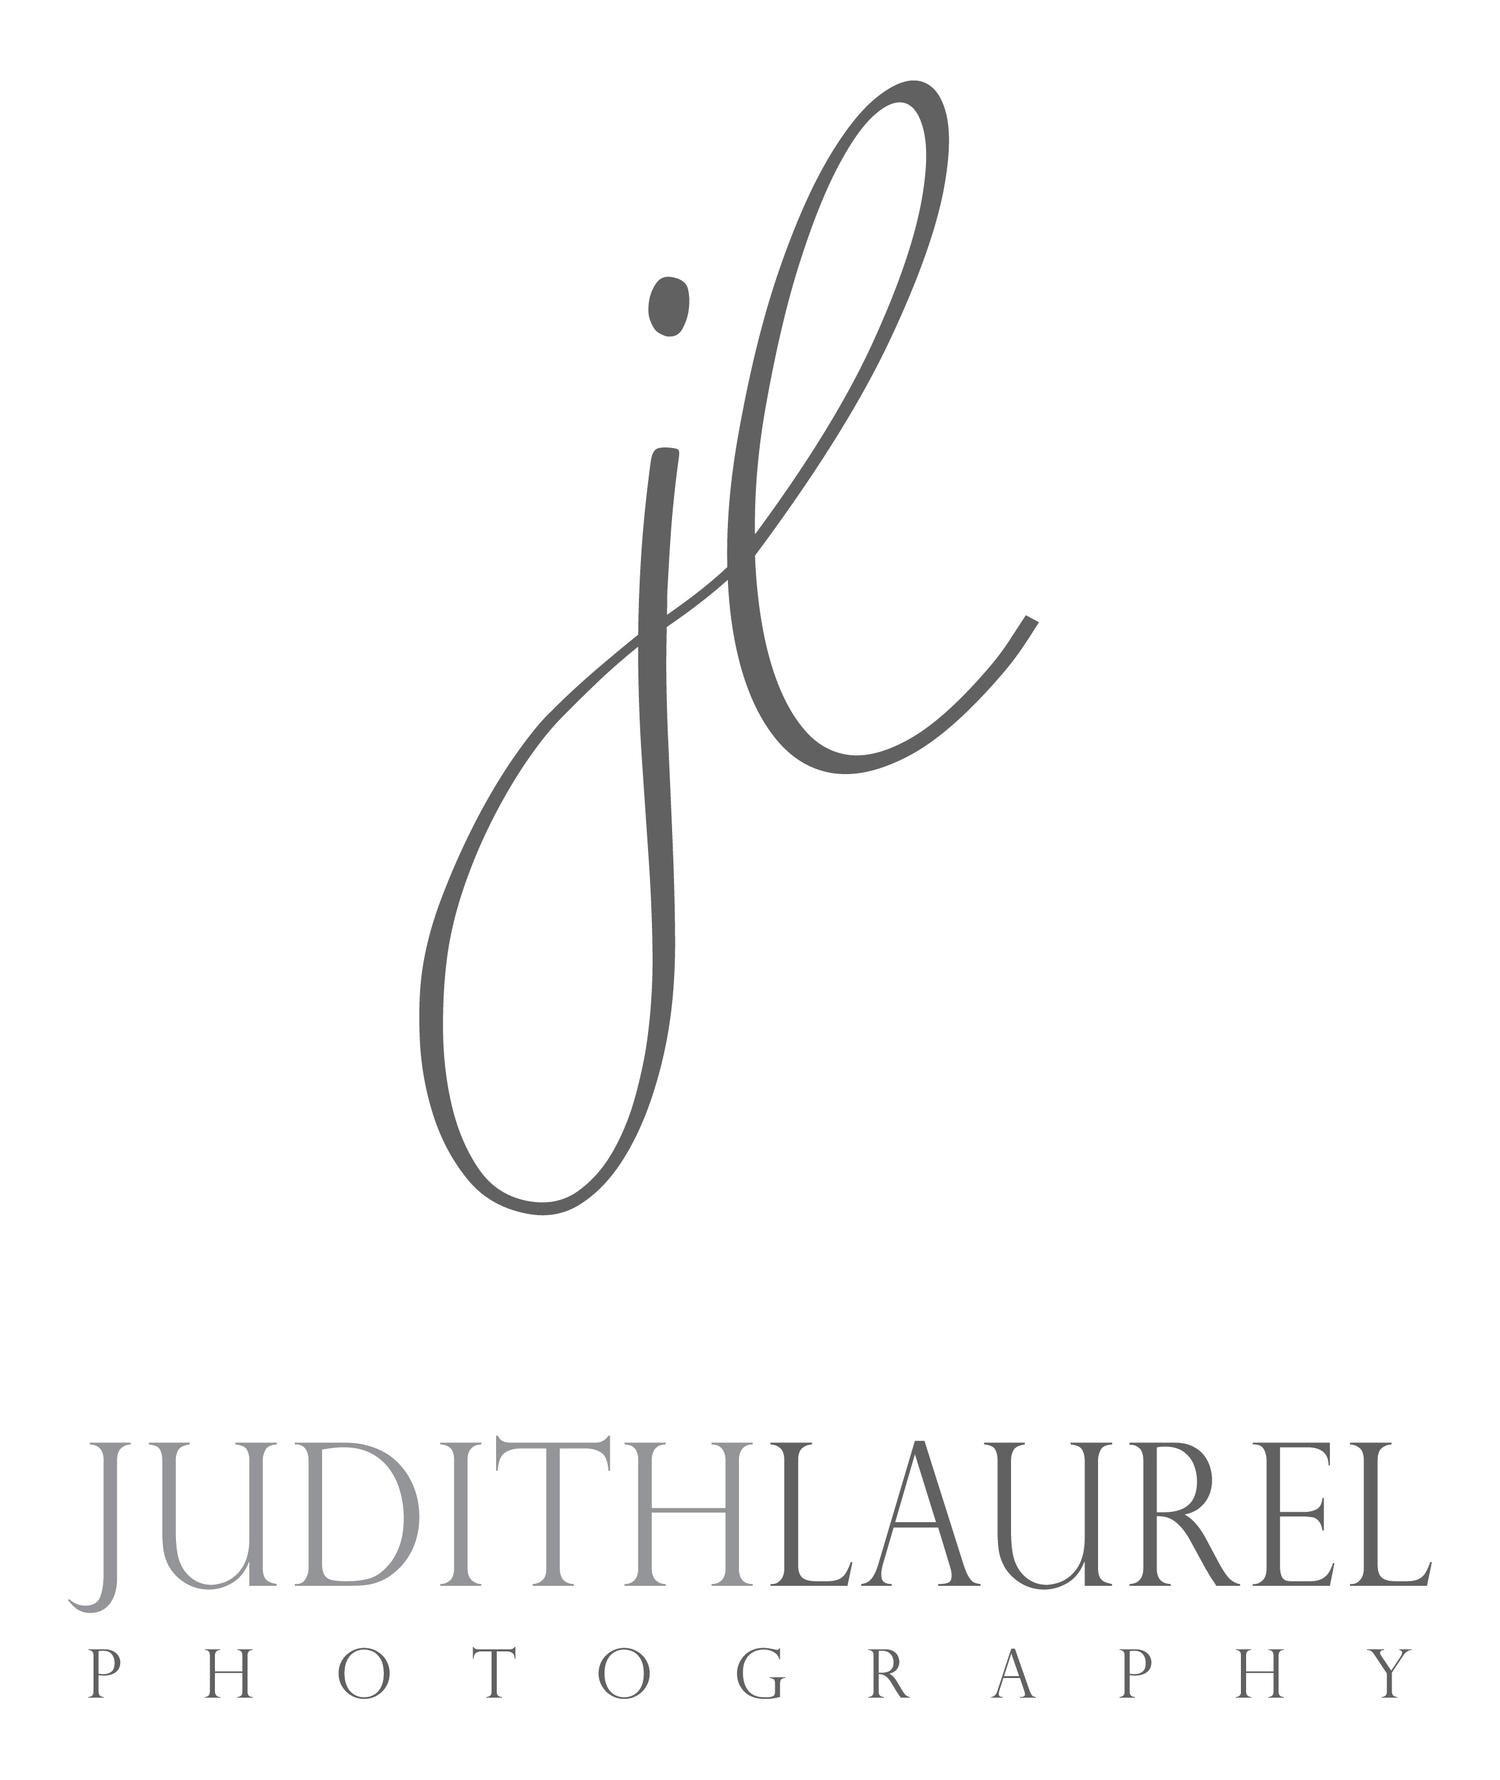 Judith Laurel Photography logo